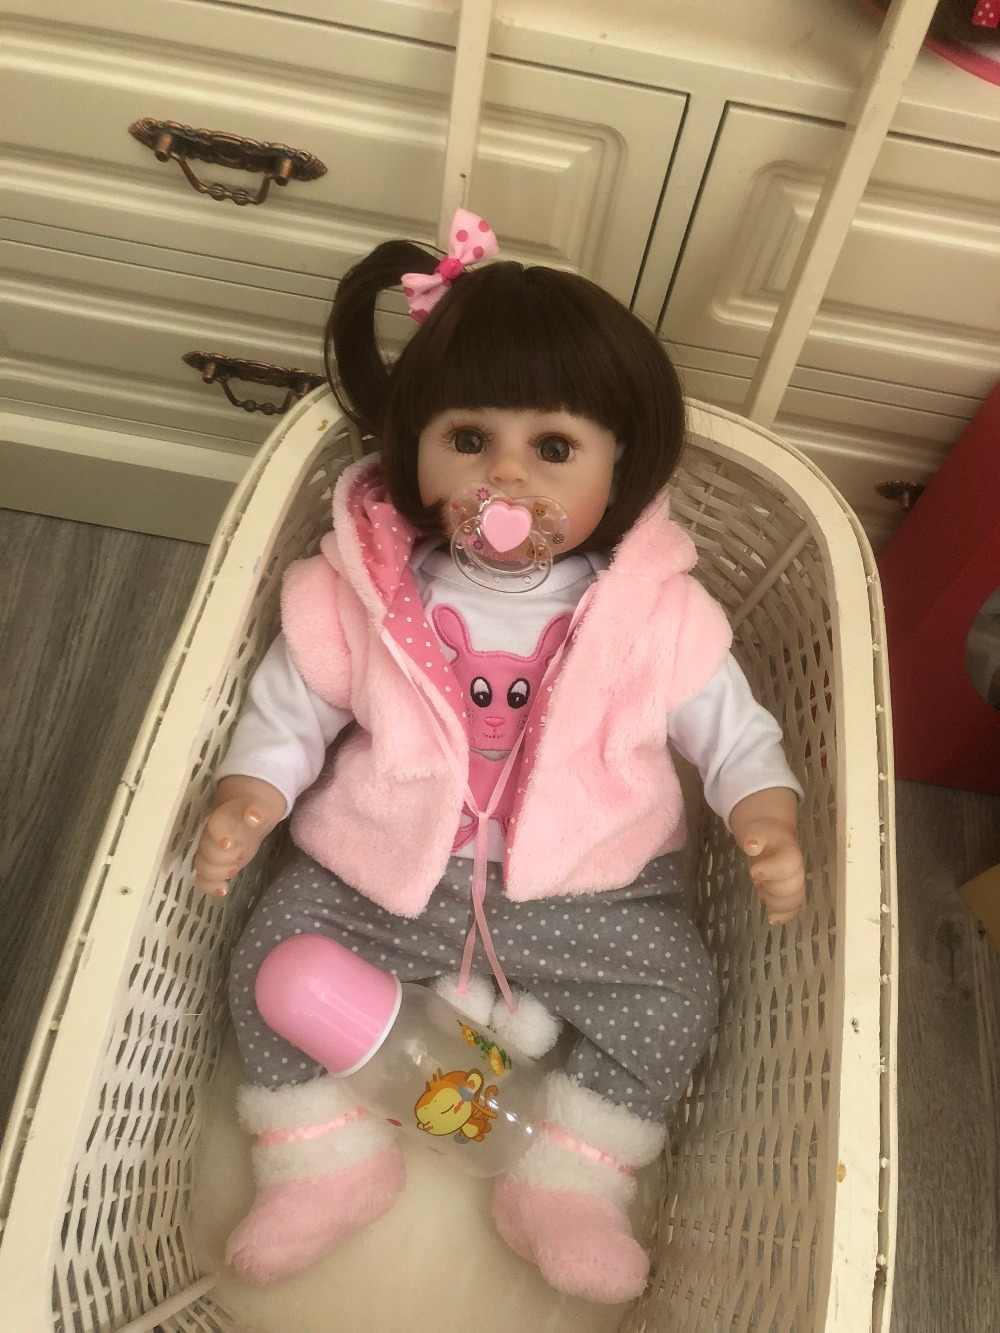 NPK 47 см Силиконовая Кукла Reborn Super Baby Lifelike baby Bonecas кукла Bebes Reborn Brinquedos Reborn игрушки для детей Подарки